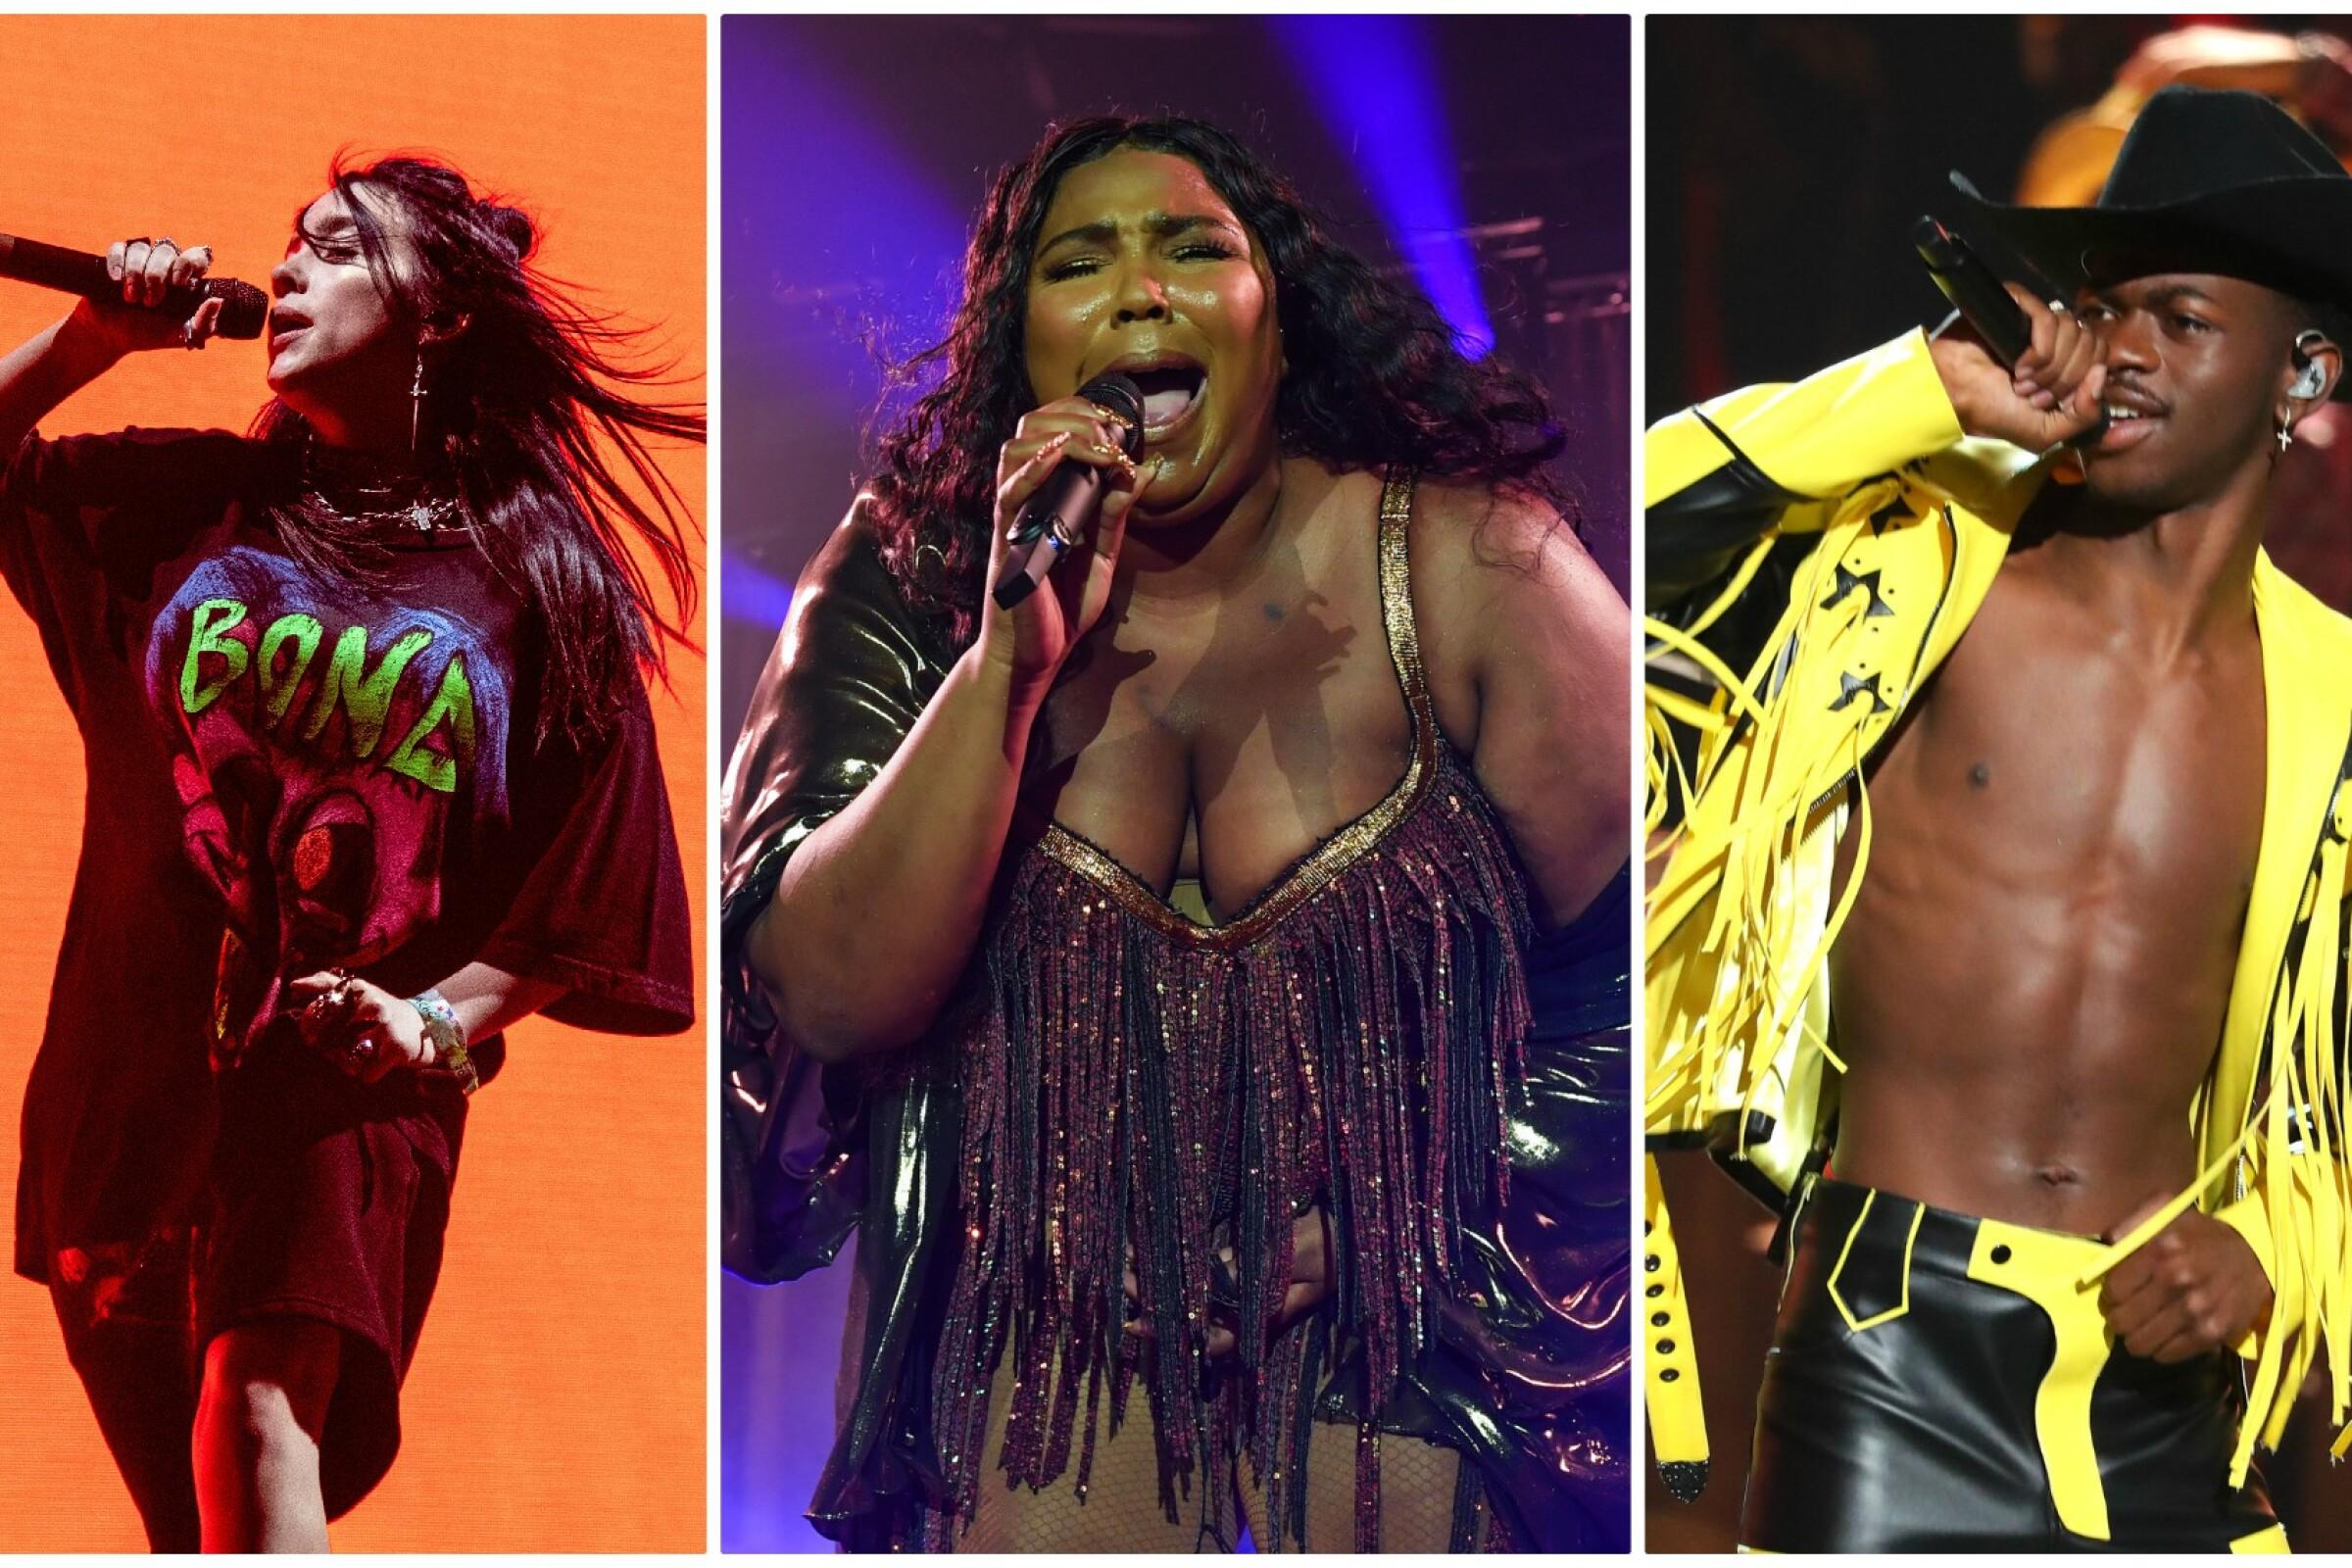 2020 Grammys Full Show.2020 Grammy Nominations List Lizzo Billie Eilish And Lil